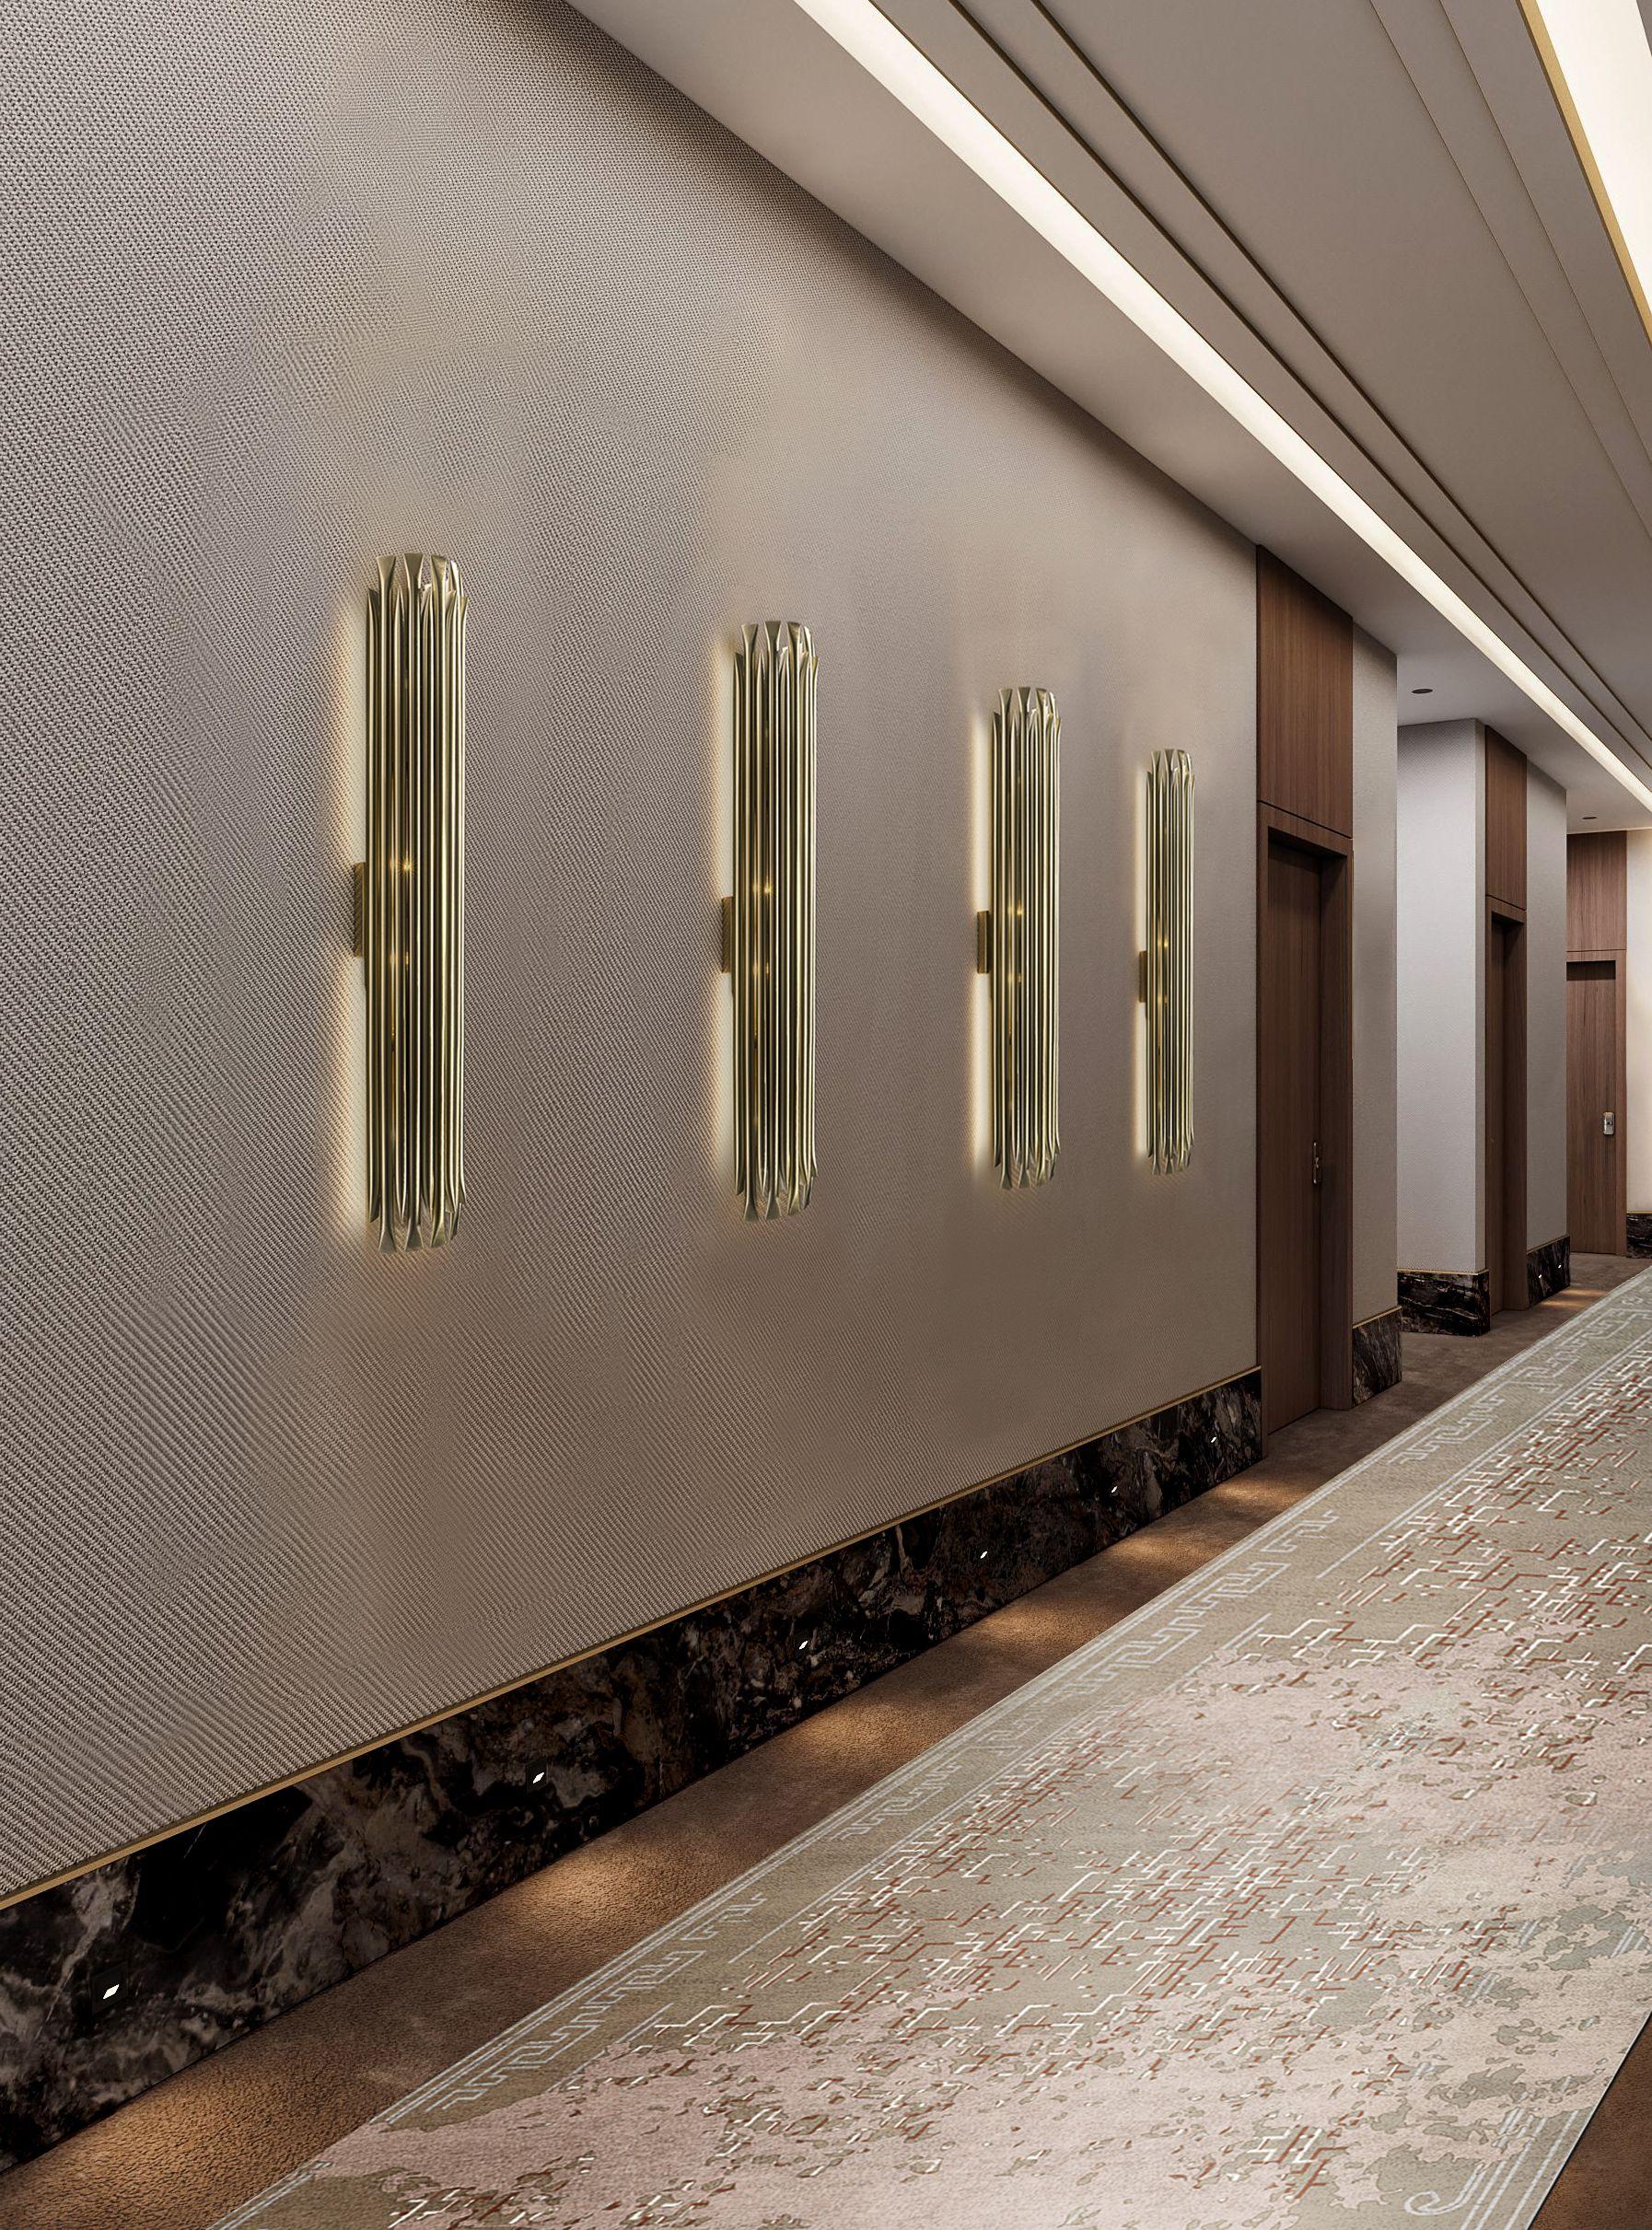 Living Room and Hallway Designs, living room, dining room, design home inspiration ideas